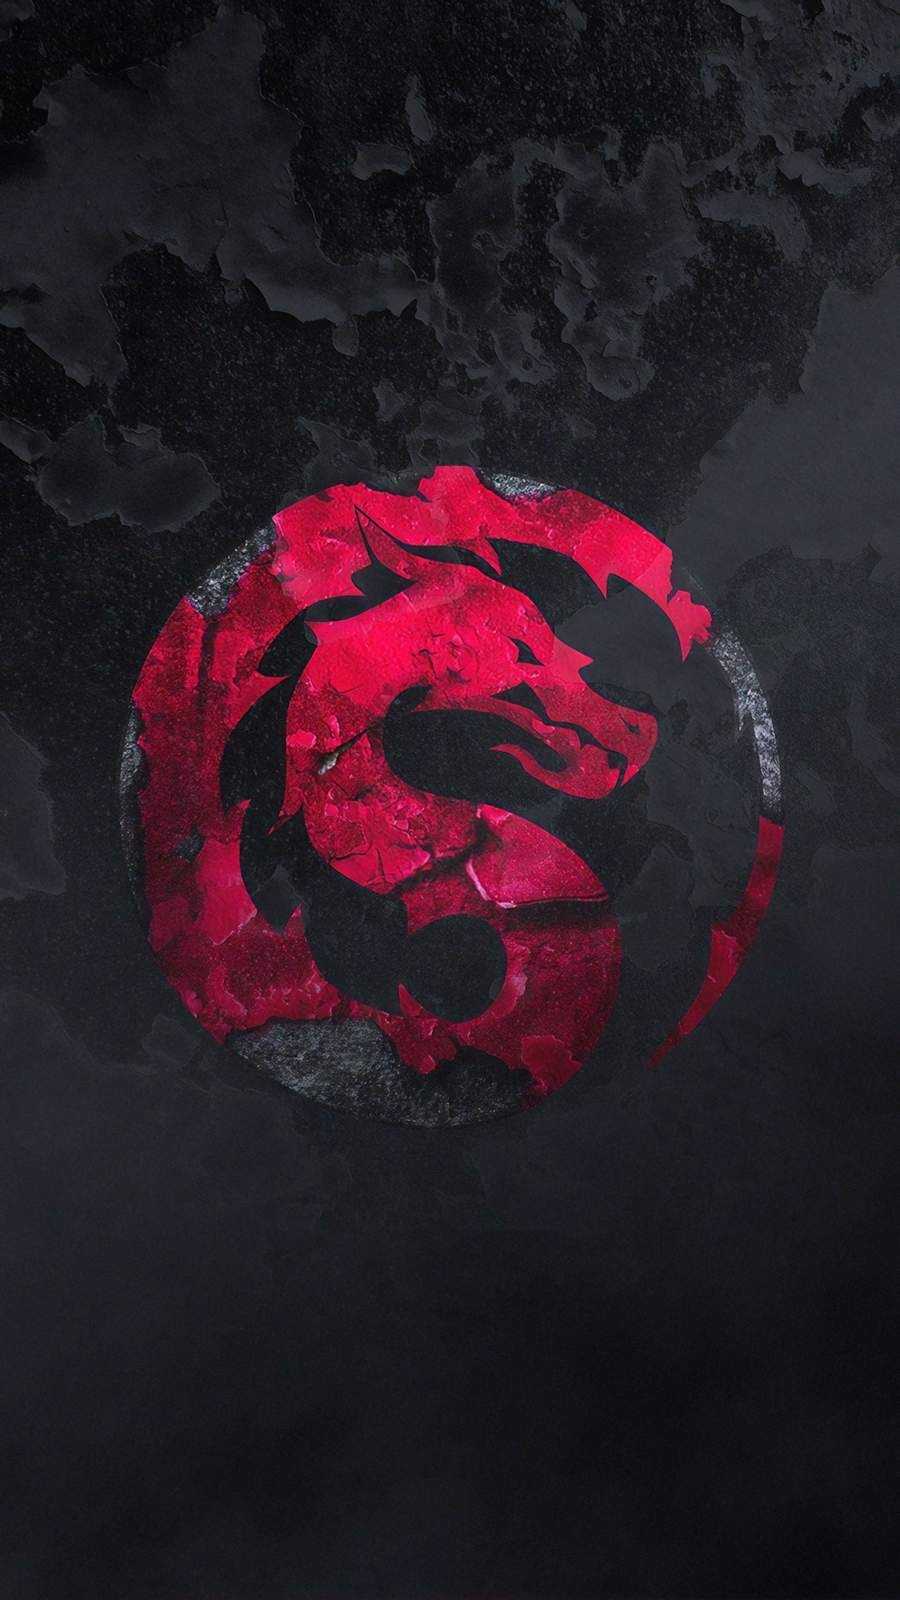 Mortal Kombat Logo Iphone Wallpaper Iphone Wallpaper Mortal Kombat Movies Full Movies Online Free